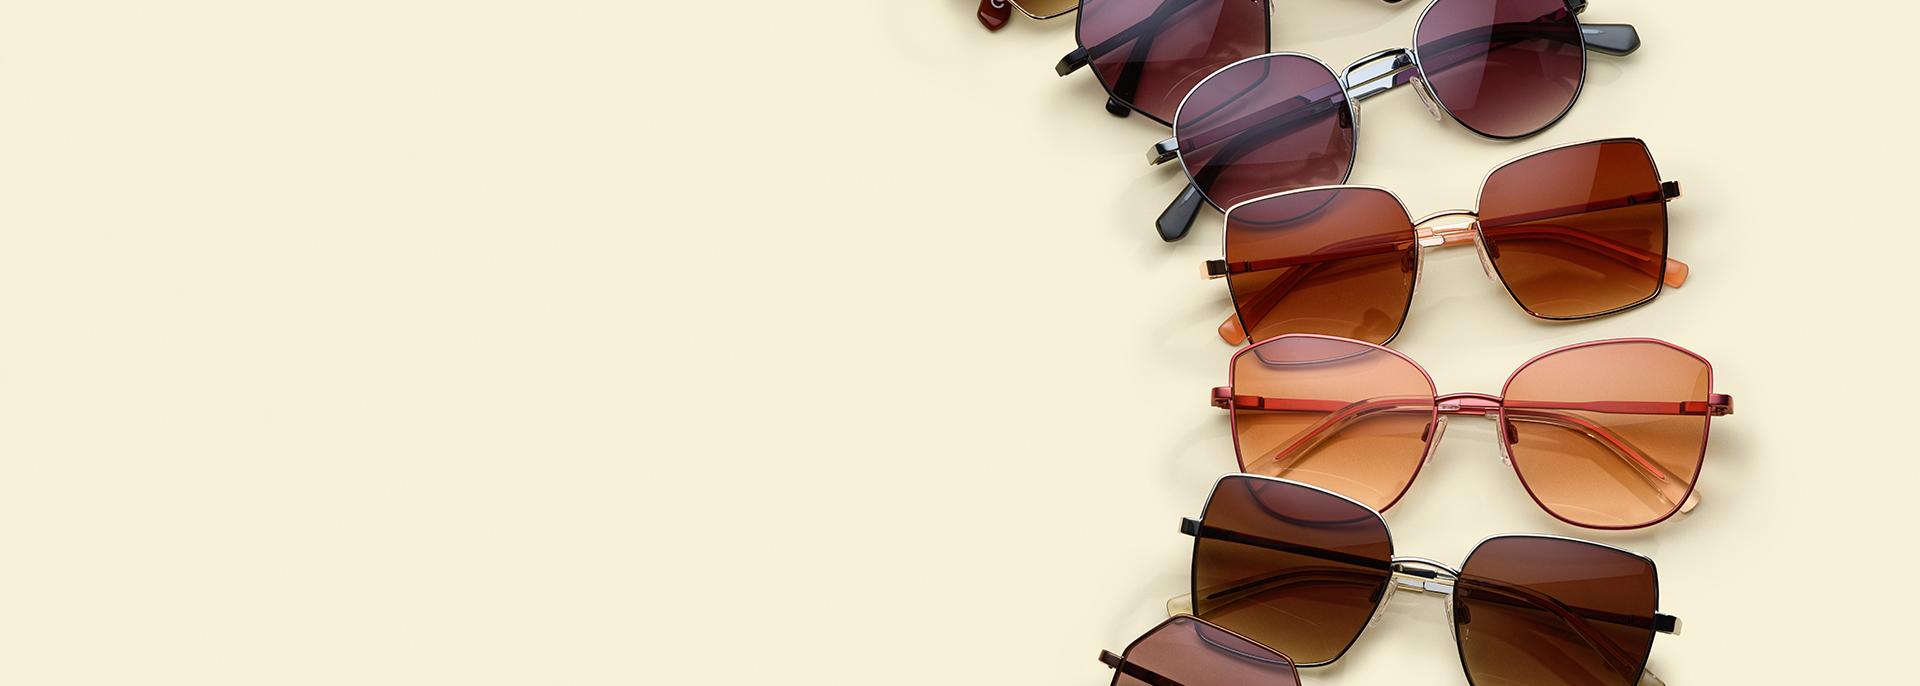 Smarteyes SunLab - solglasögon i din styrka